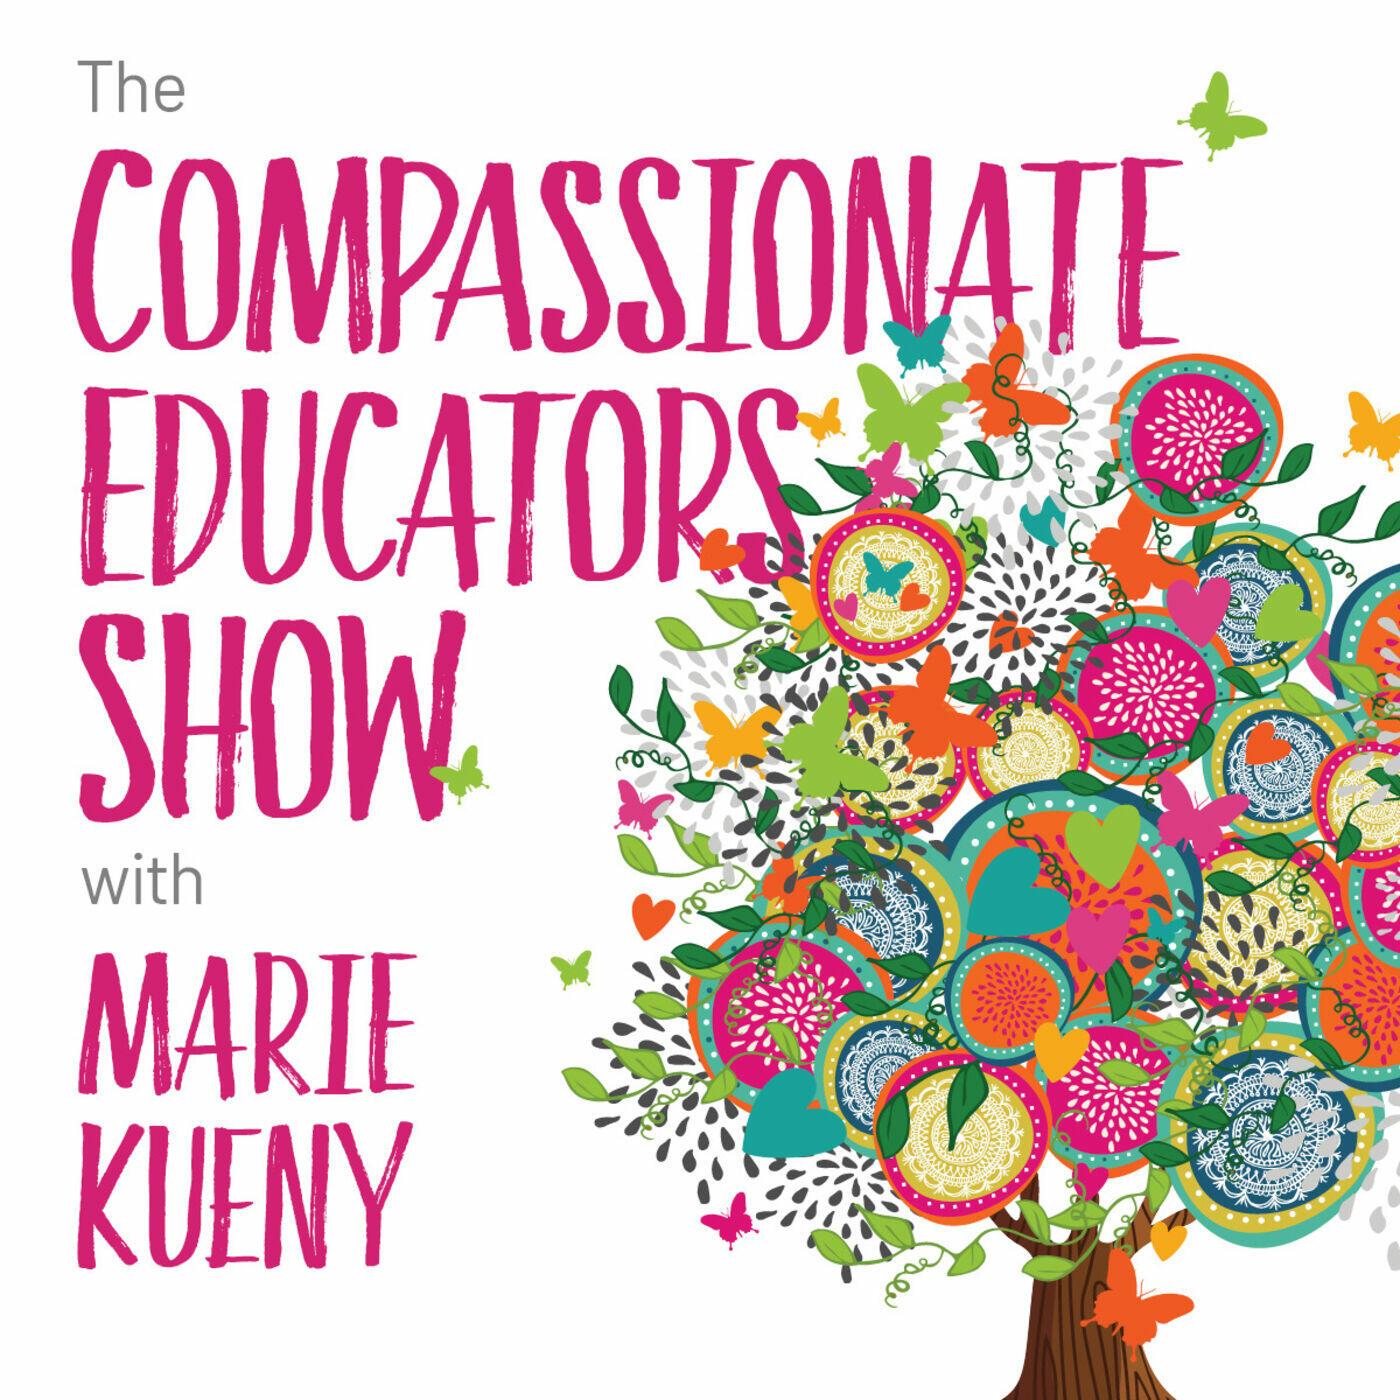 The Compassionate Educators Show